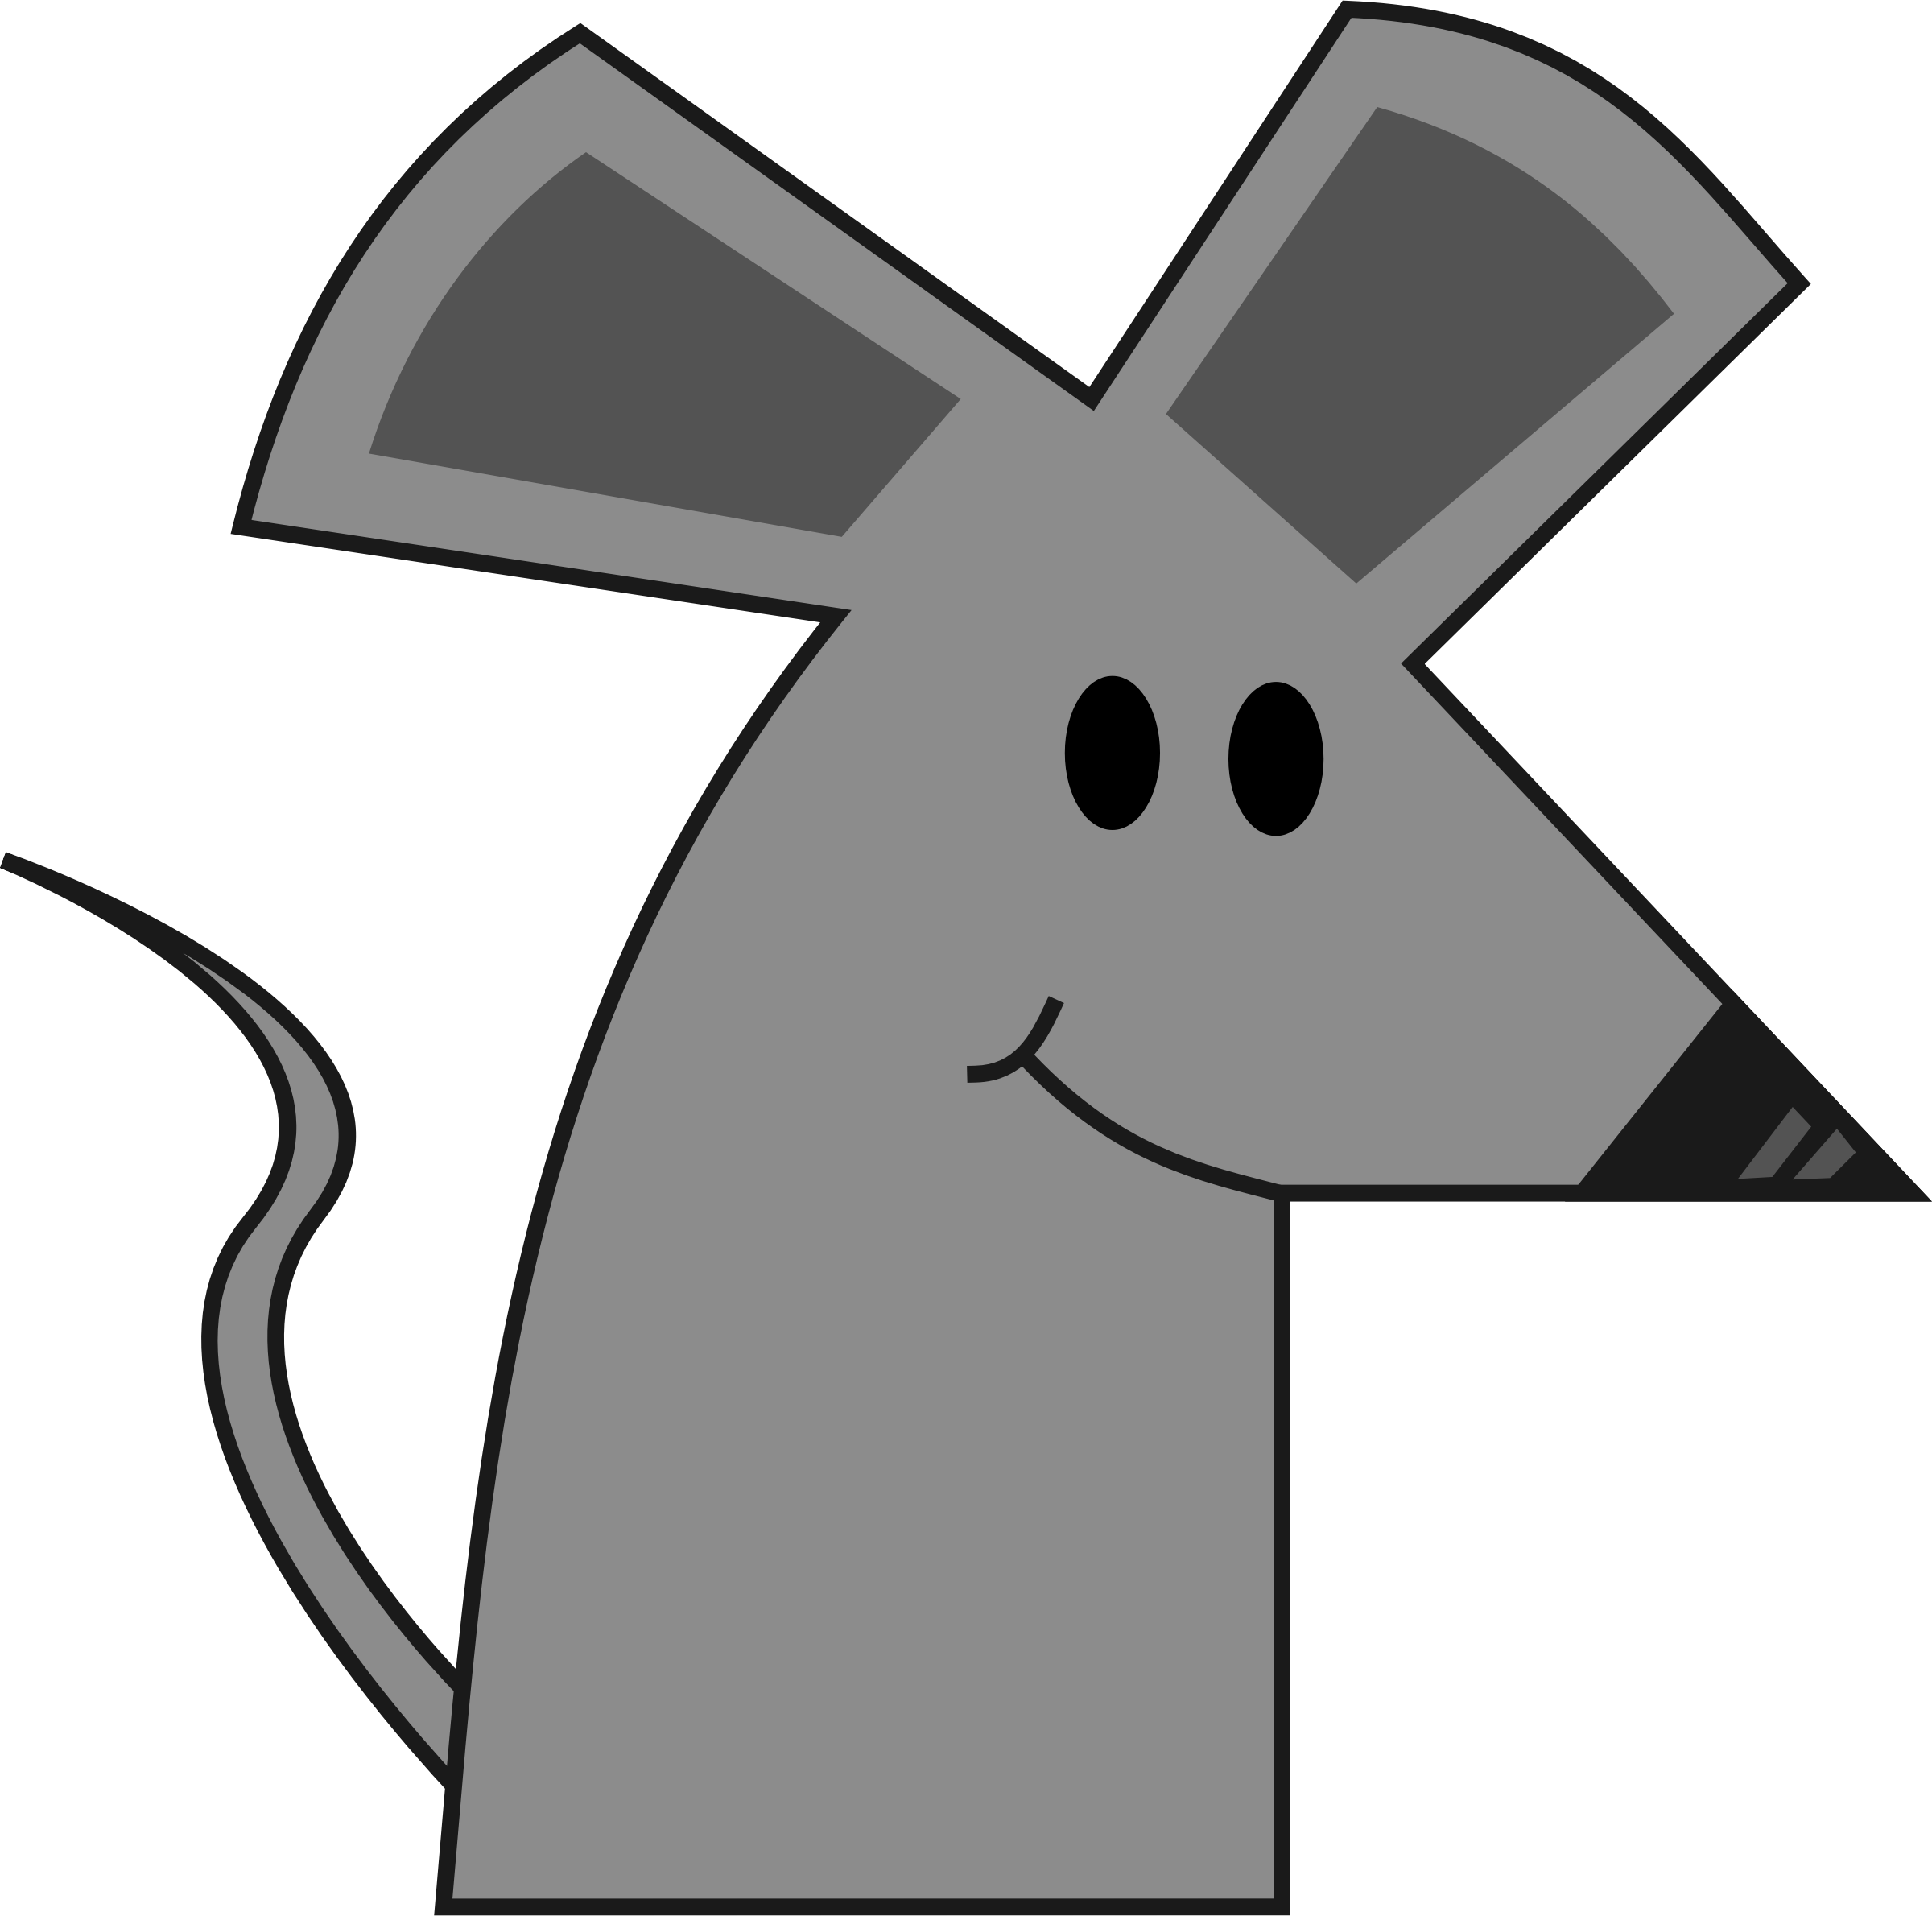 Cute smiling cartoon mouse. Clipart rat simple